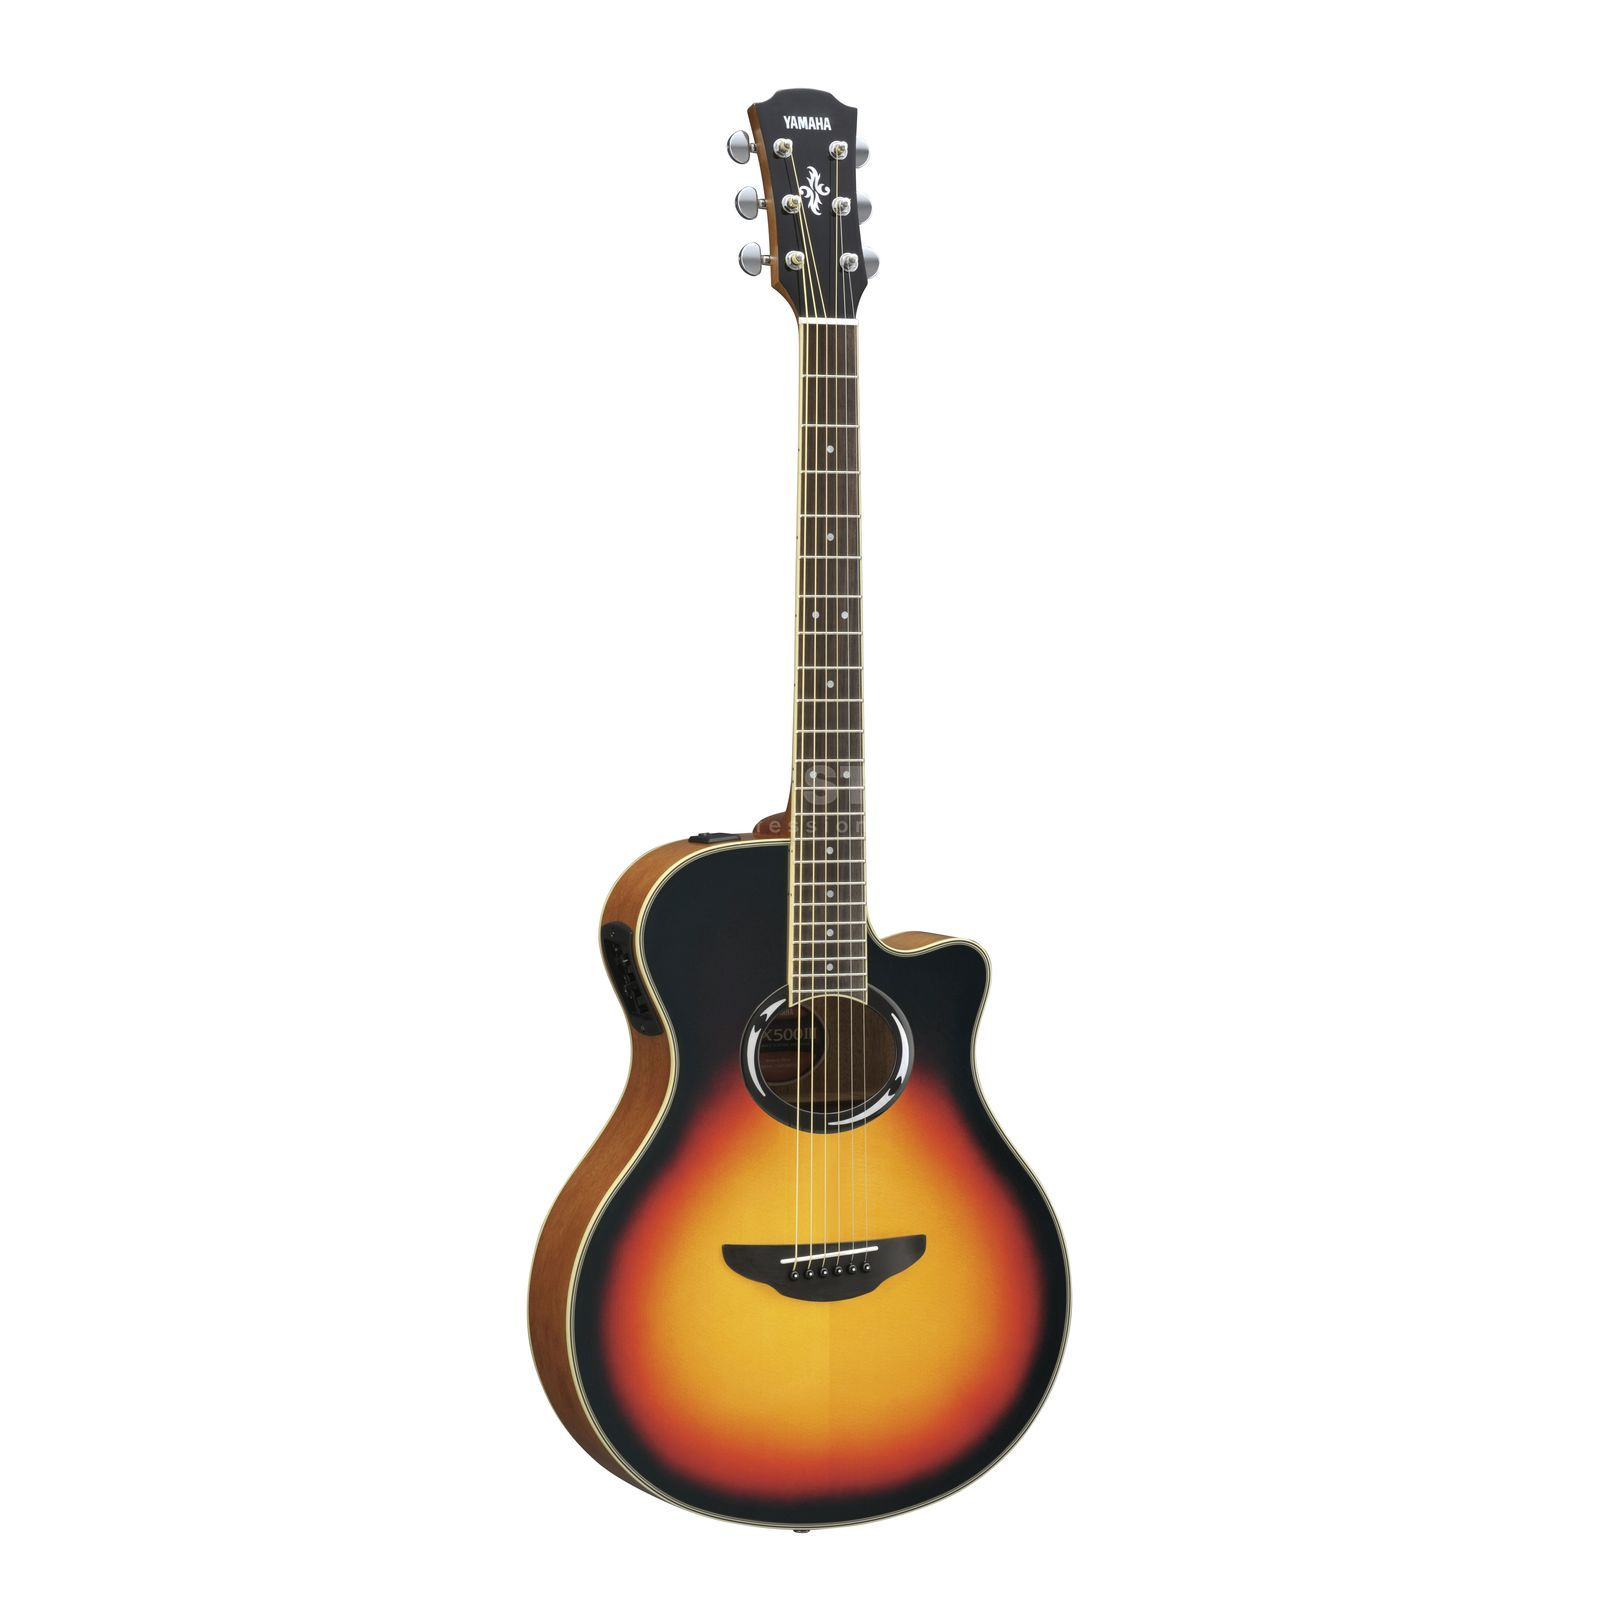 Yamaha apx 500 iii vsb vintage sunburst for Apx guitar yamaha